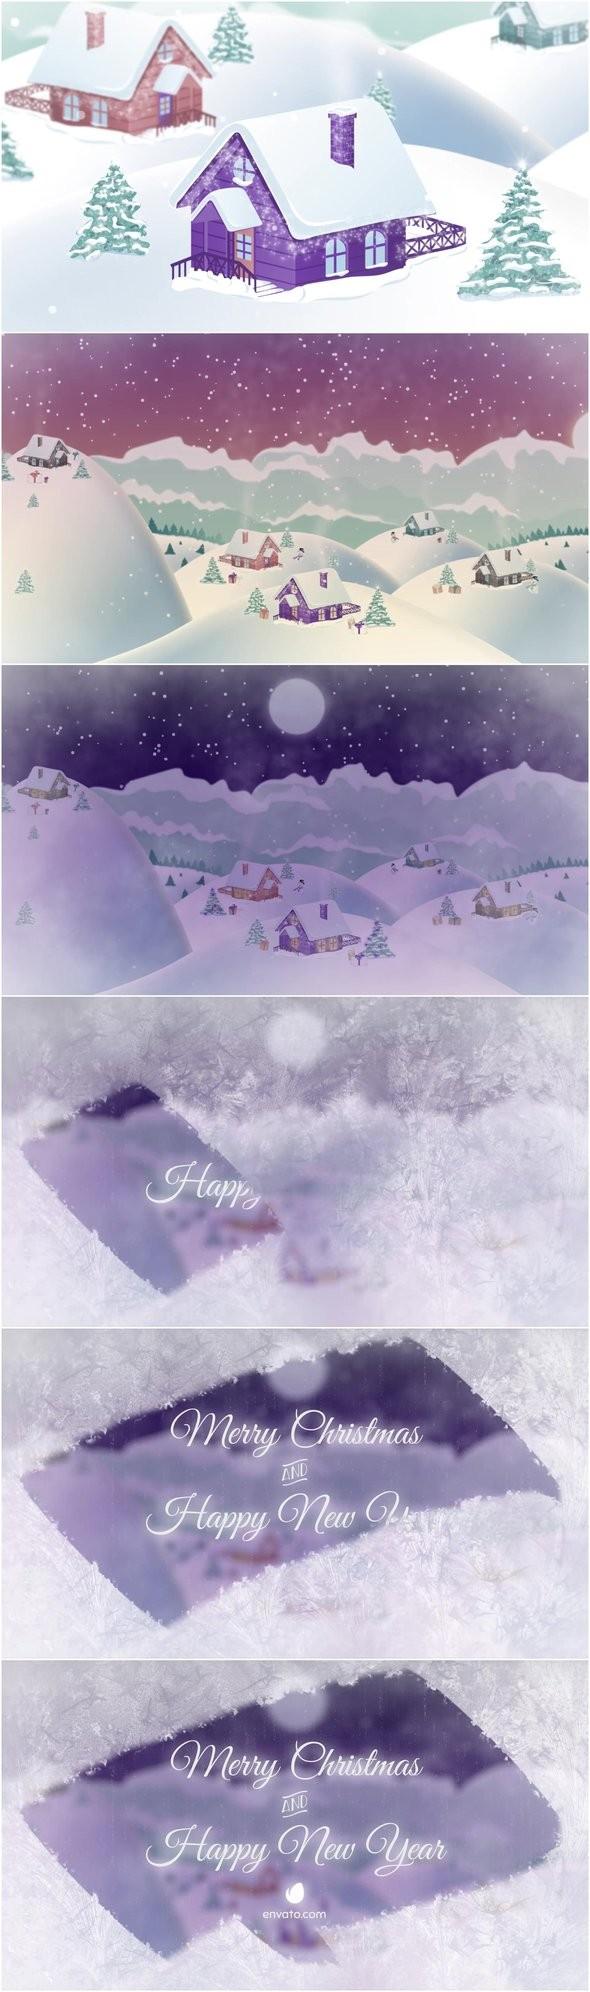 Videohive - Christmas Village Landscape 20898385